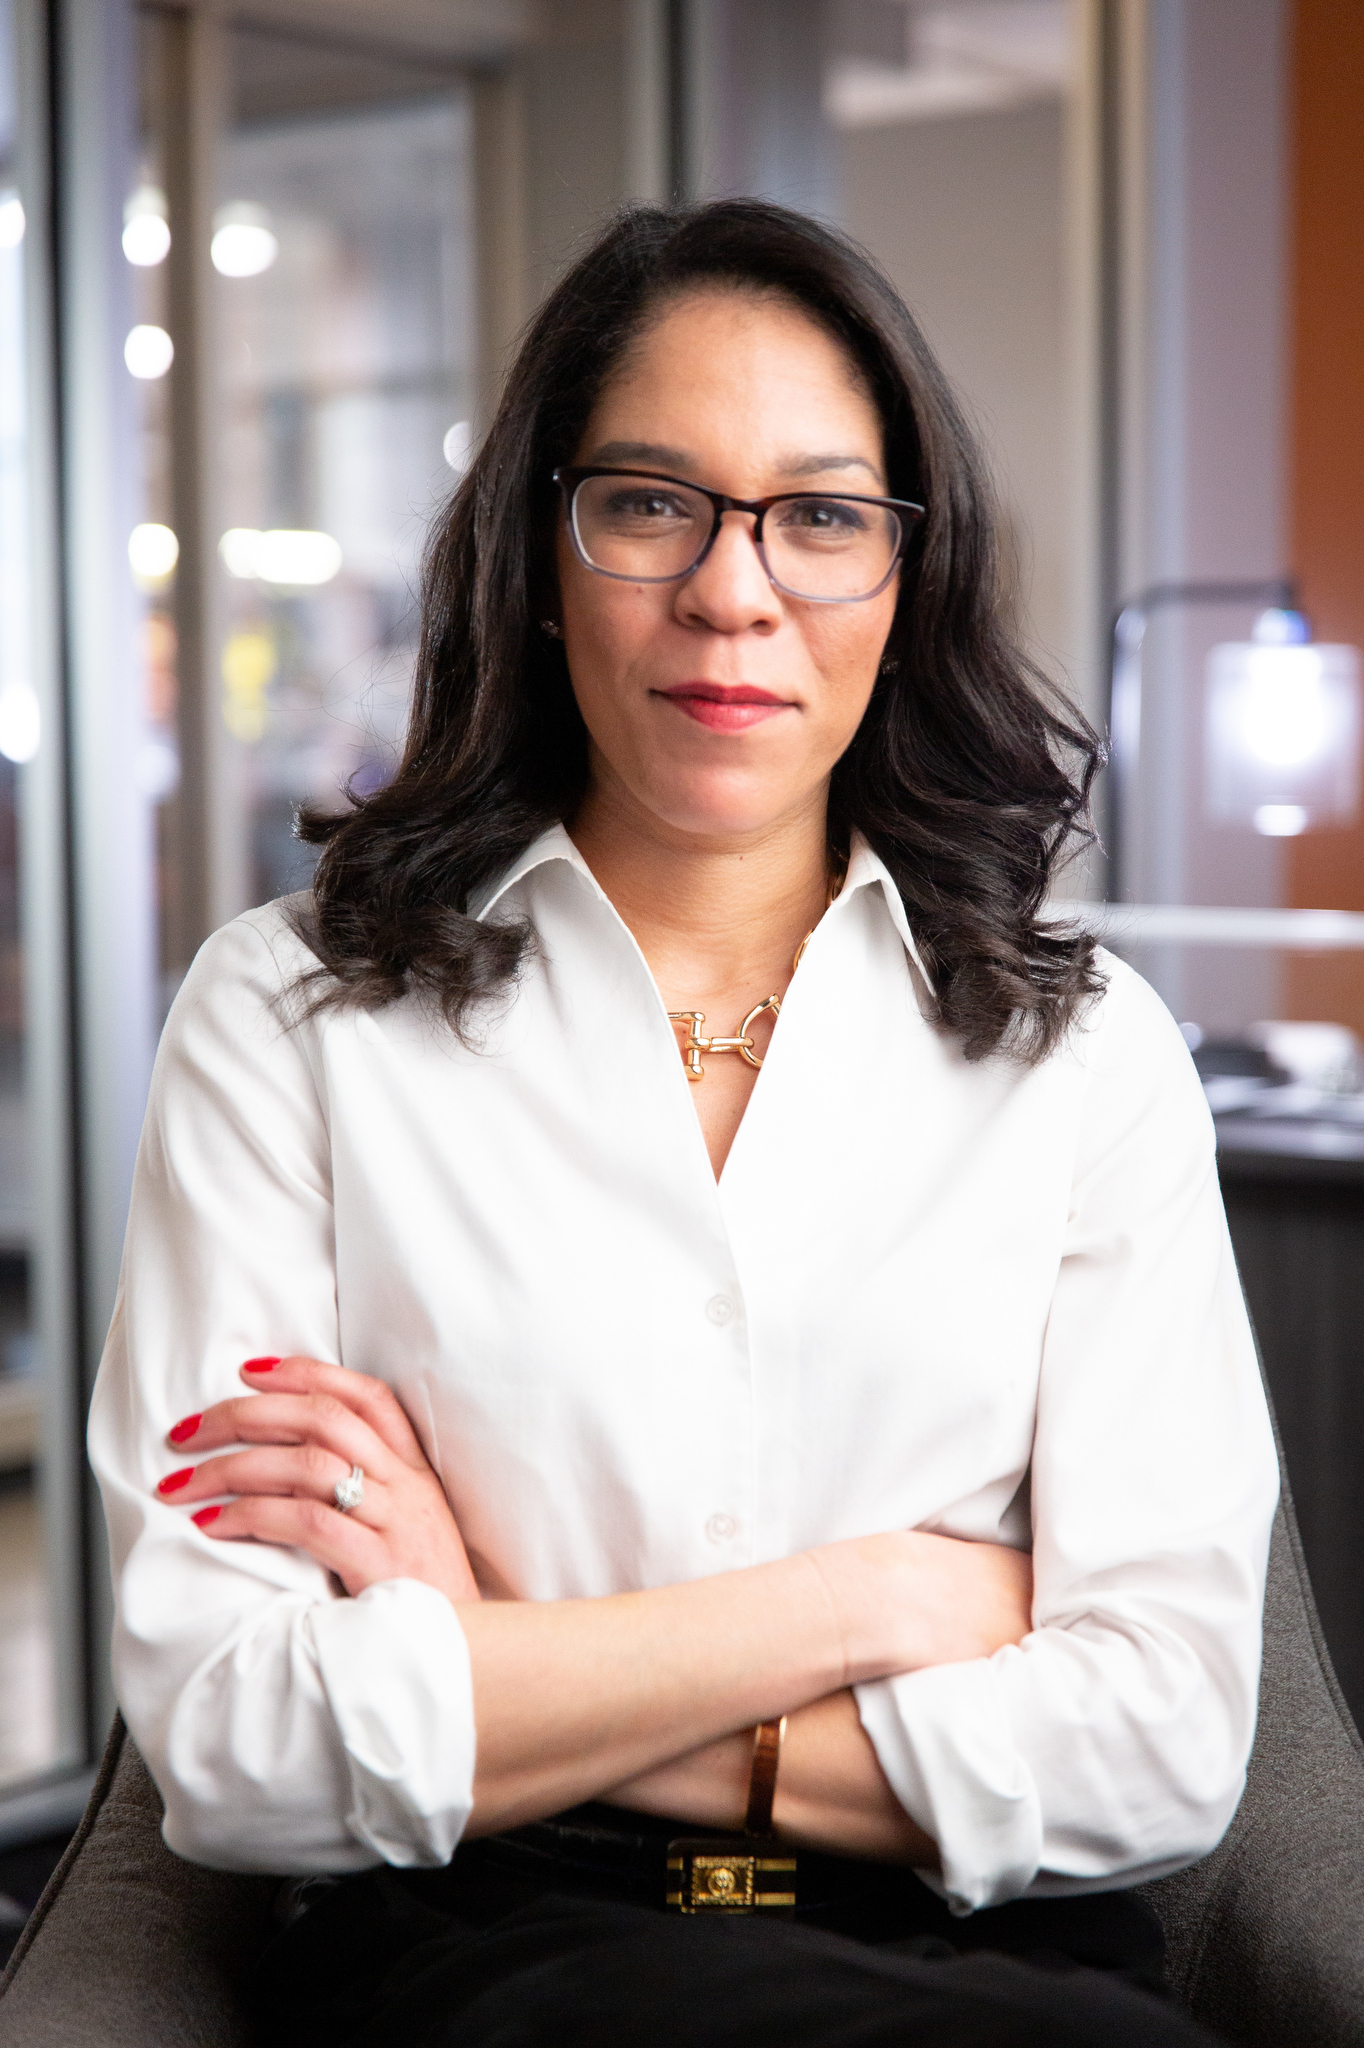 Ellington West of Sonavi Labs is a North America finalist for Cartier's 2021 Women's Initiative.